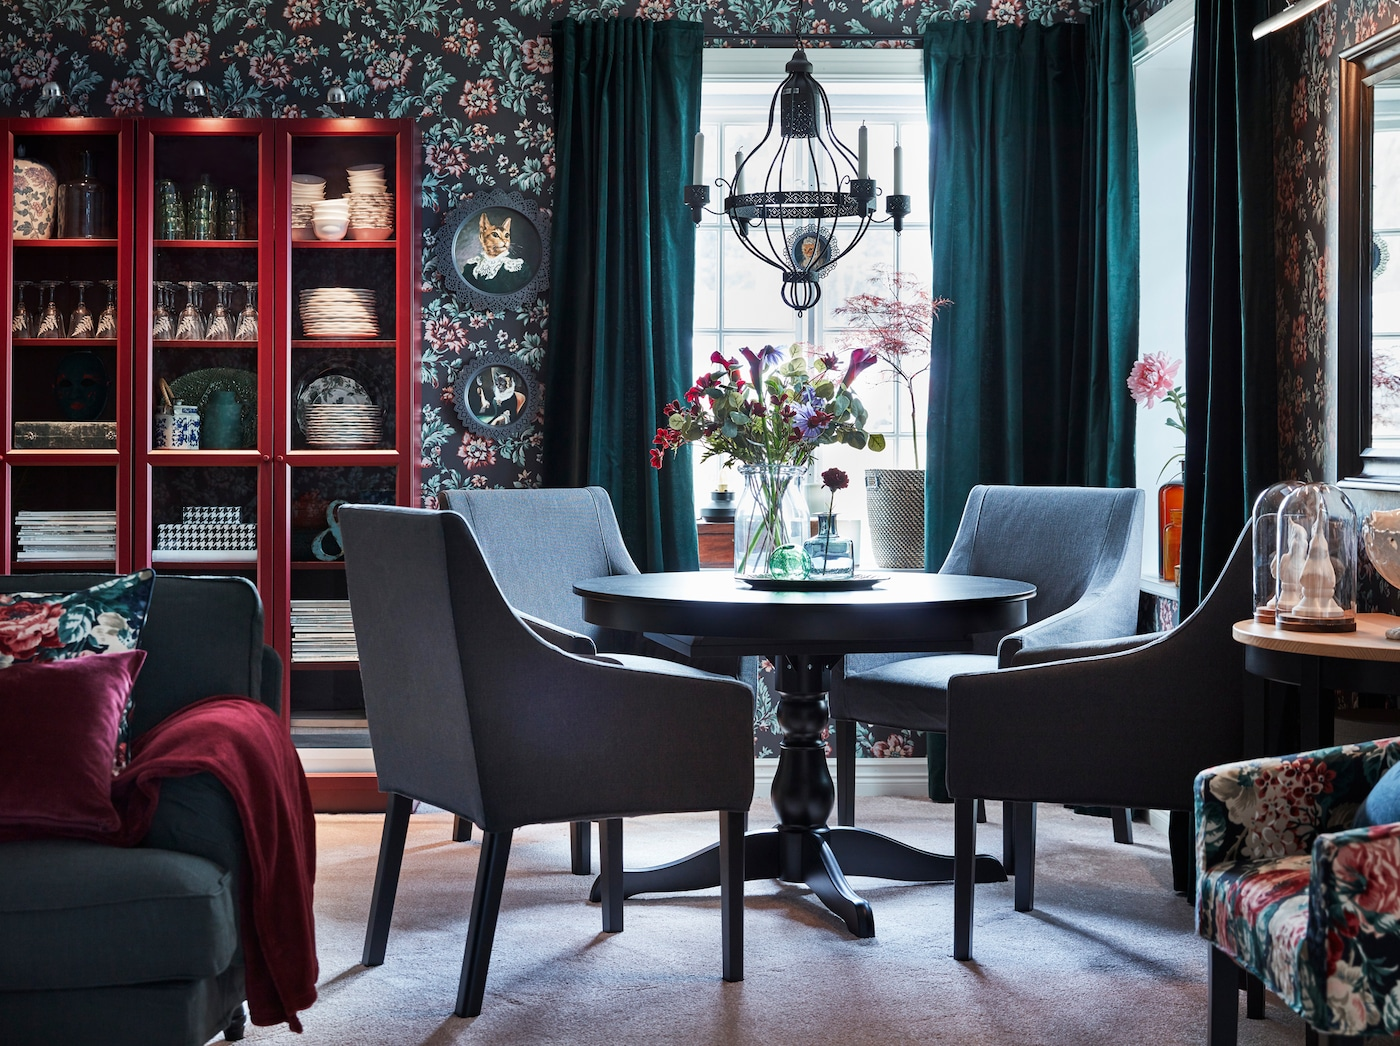 Mesa Redonda Extensible Ikea Muebles para el Hogar en